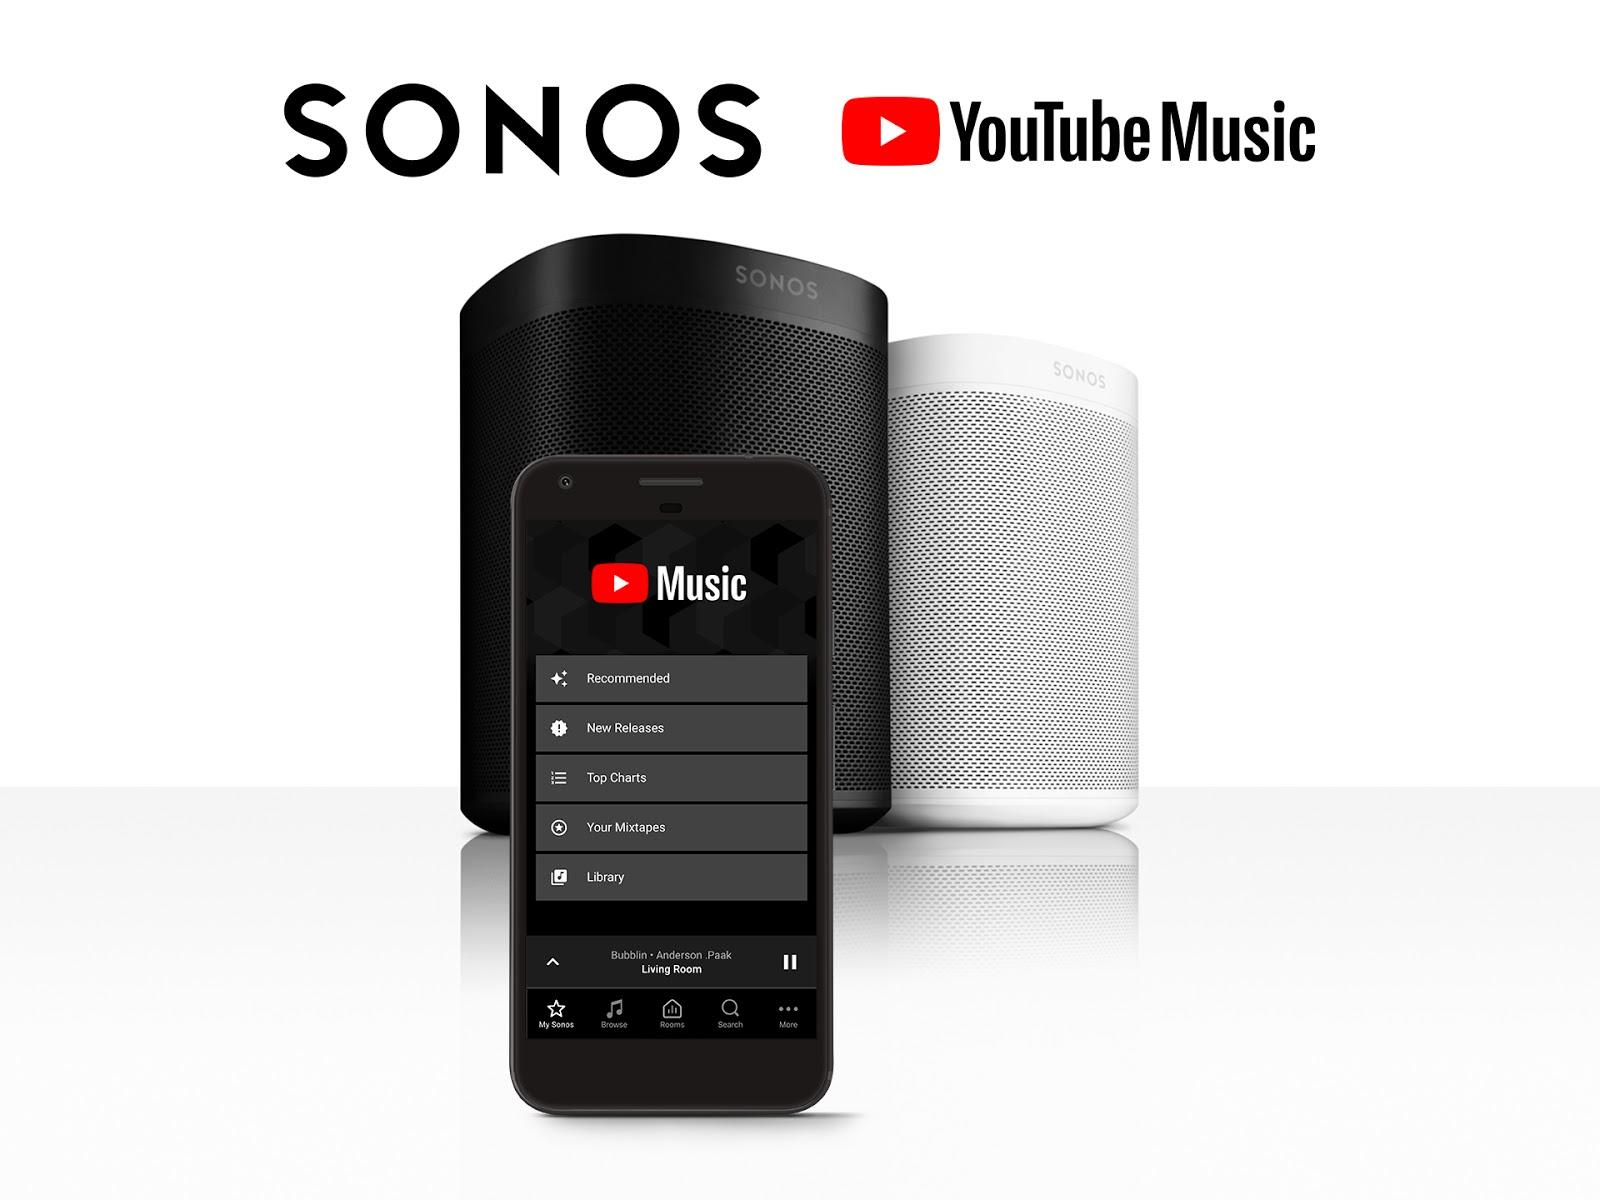 YouTube Music Sonos integration